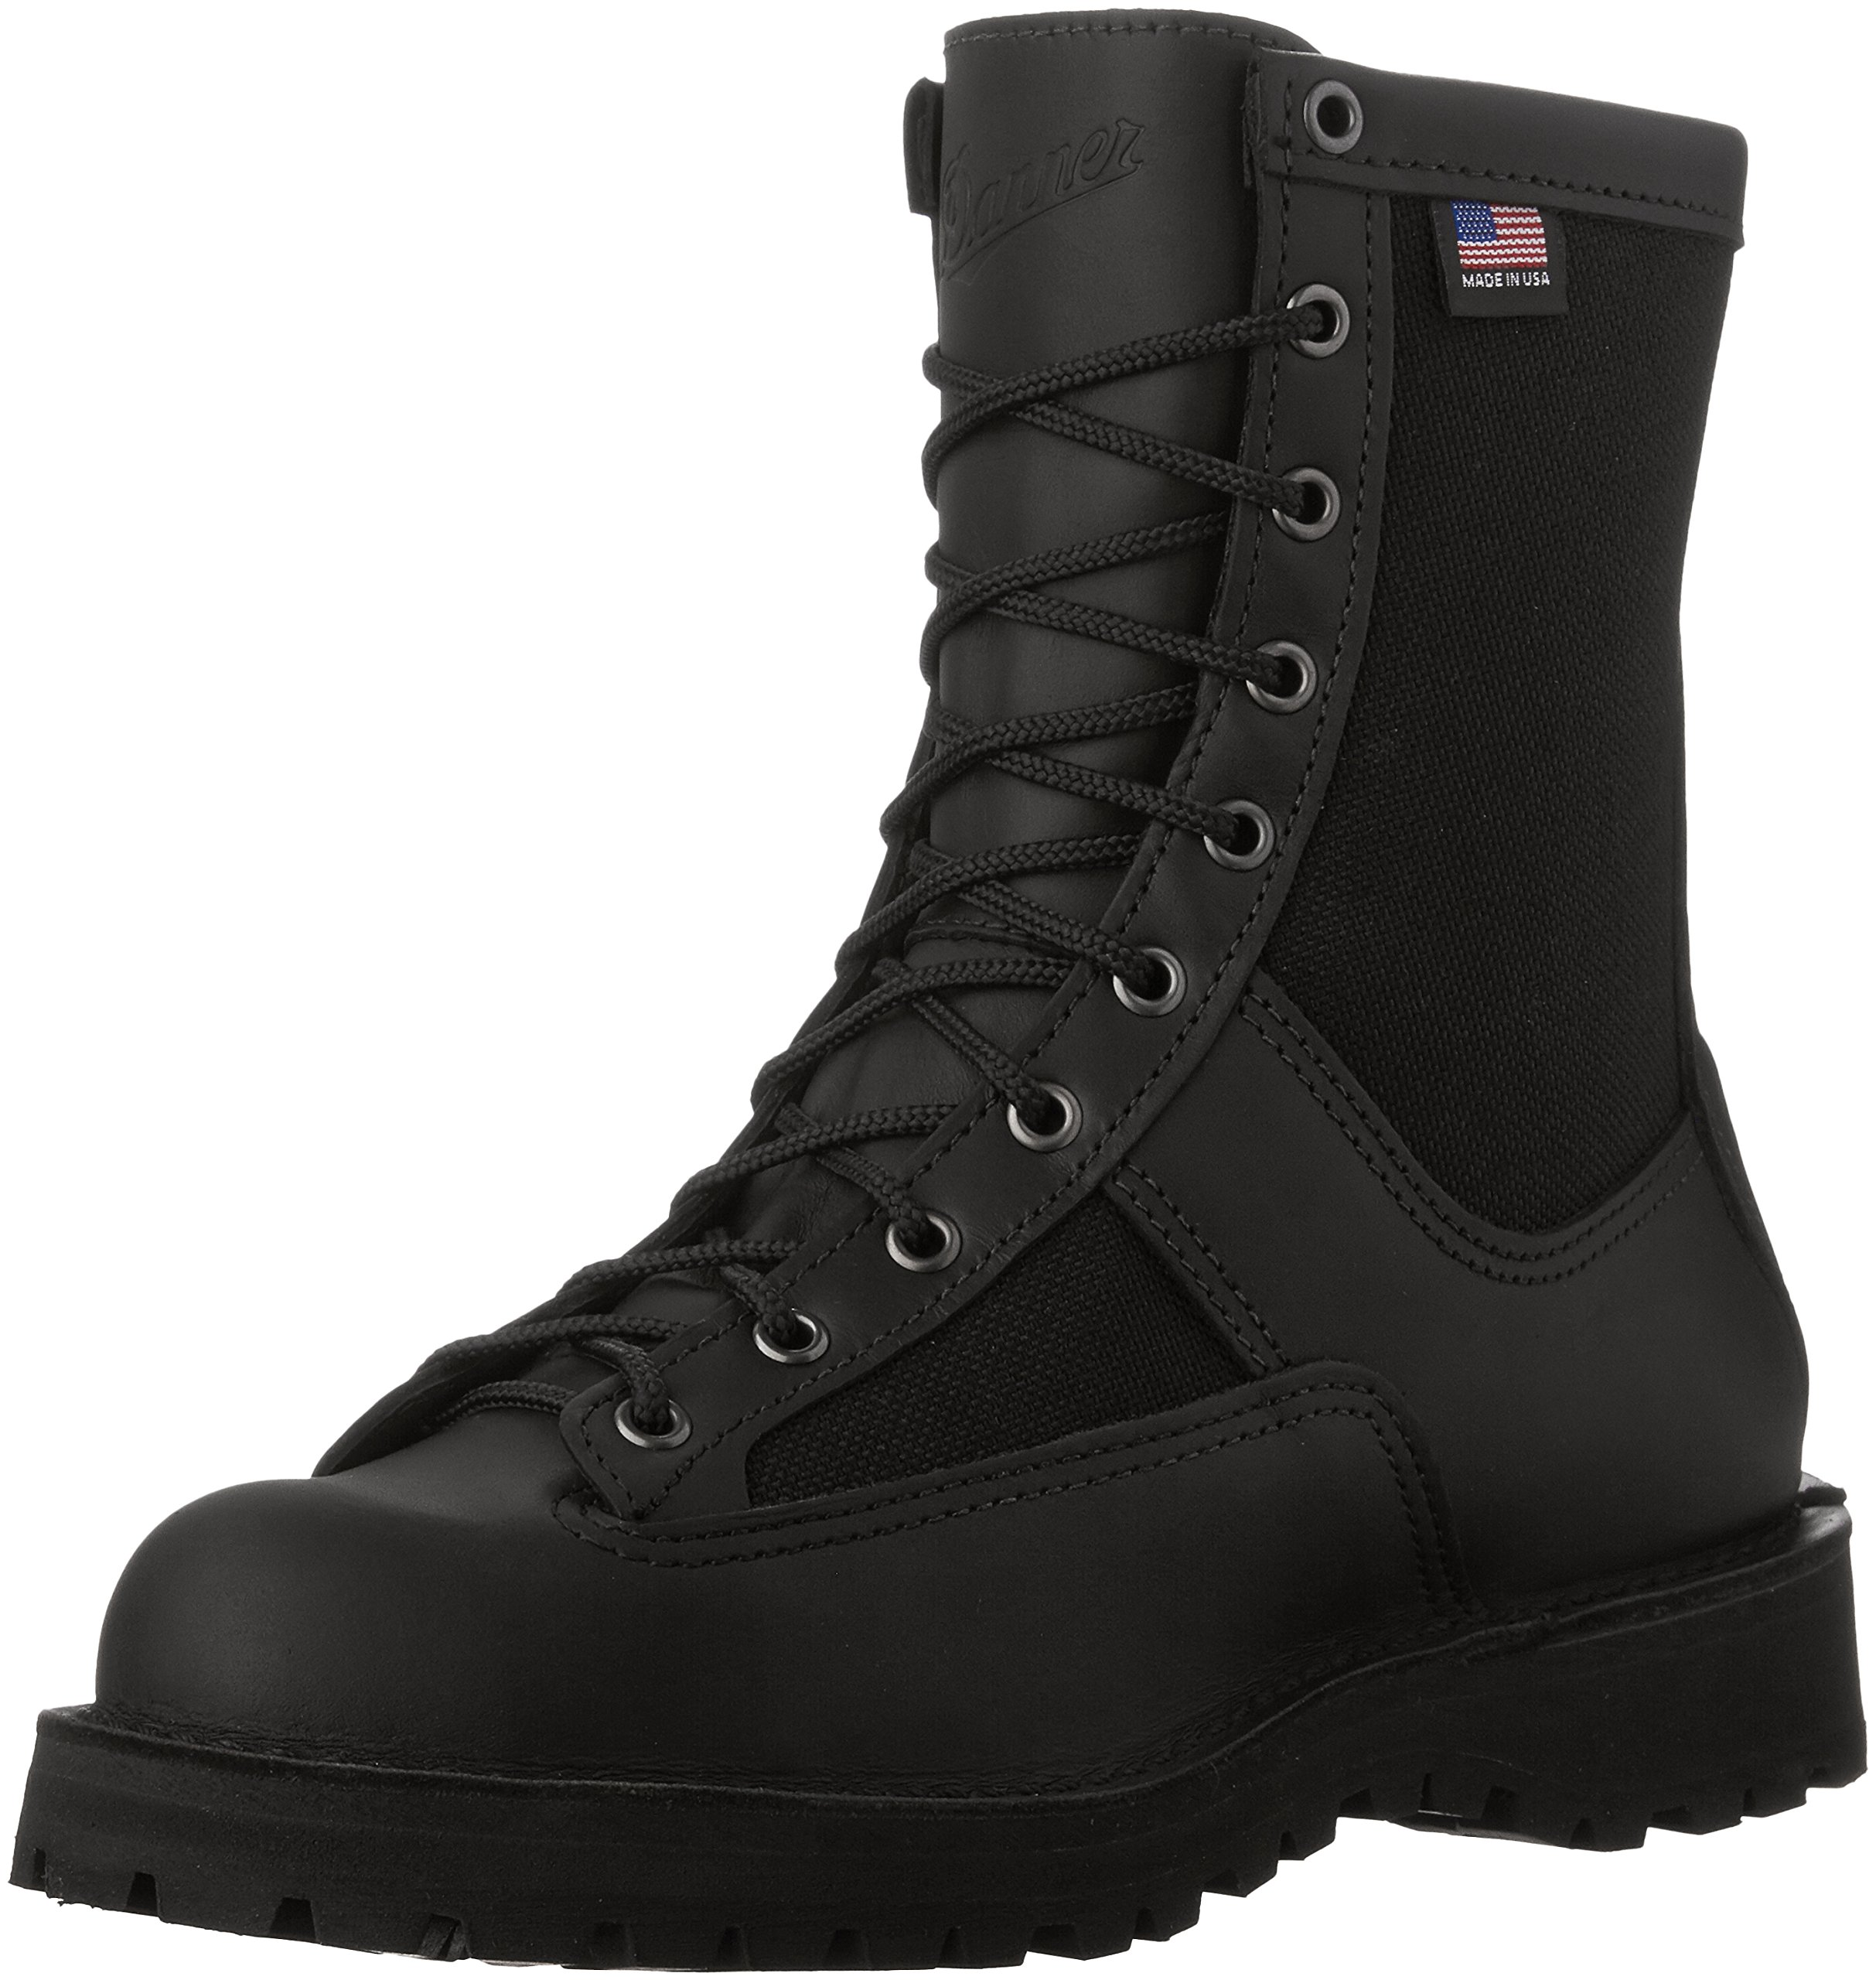 Danner Men's Acadia 8'' Boot,Black,8 EE US by Danner